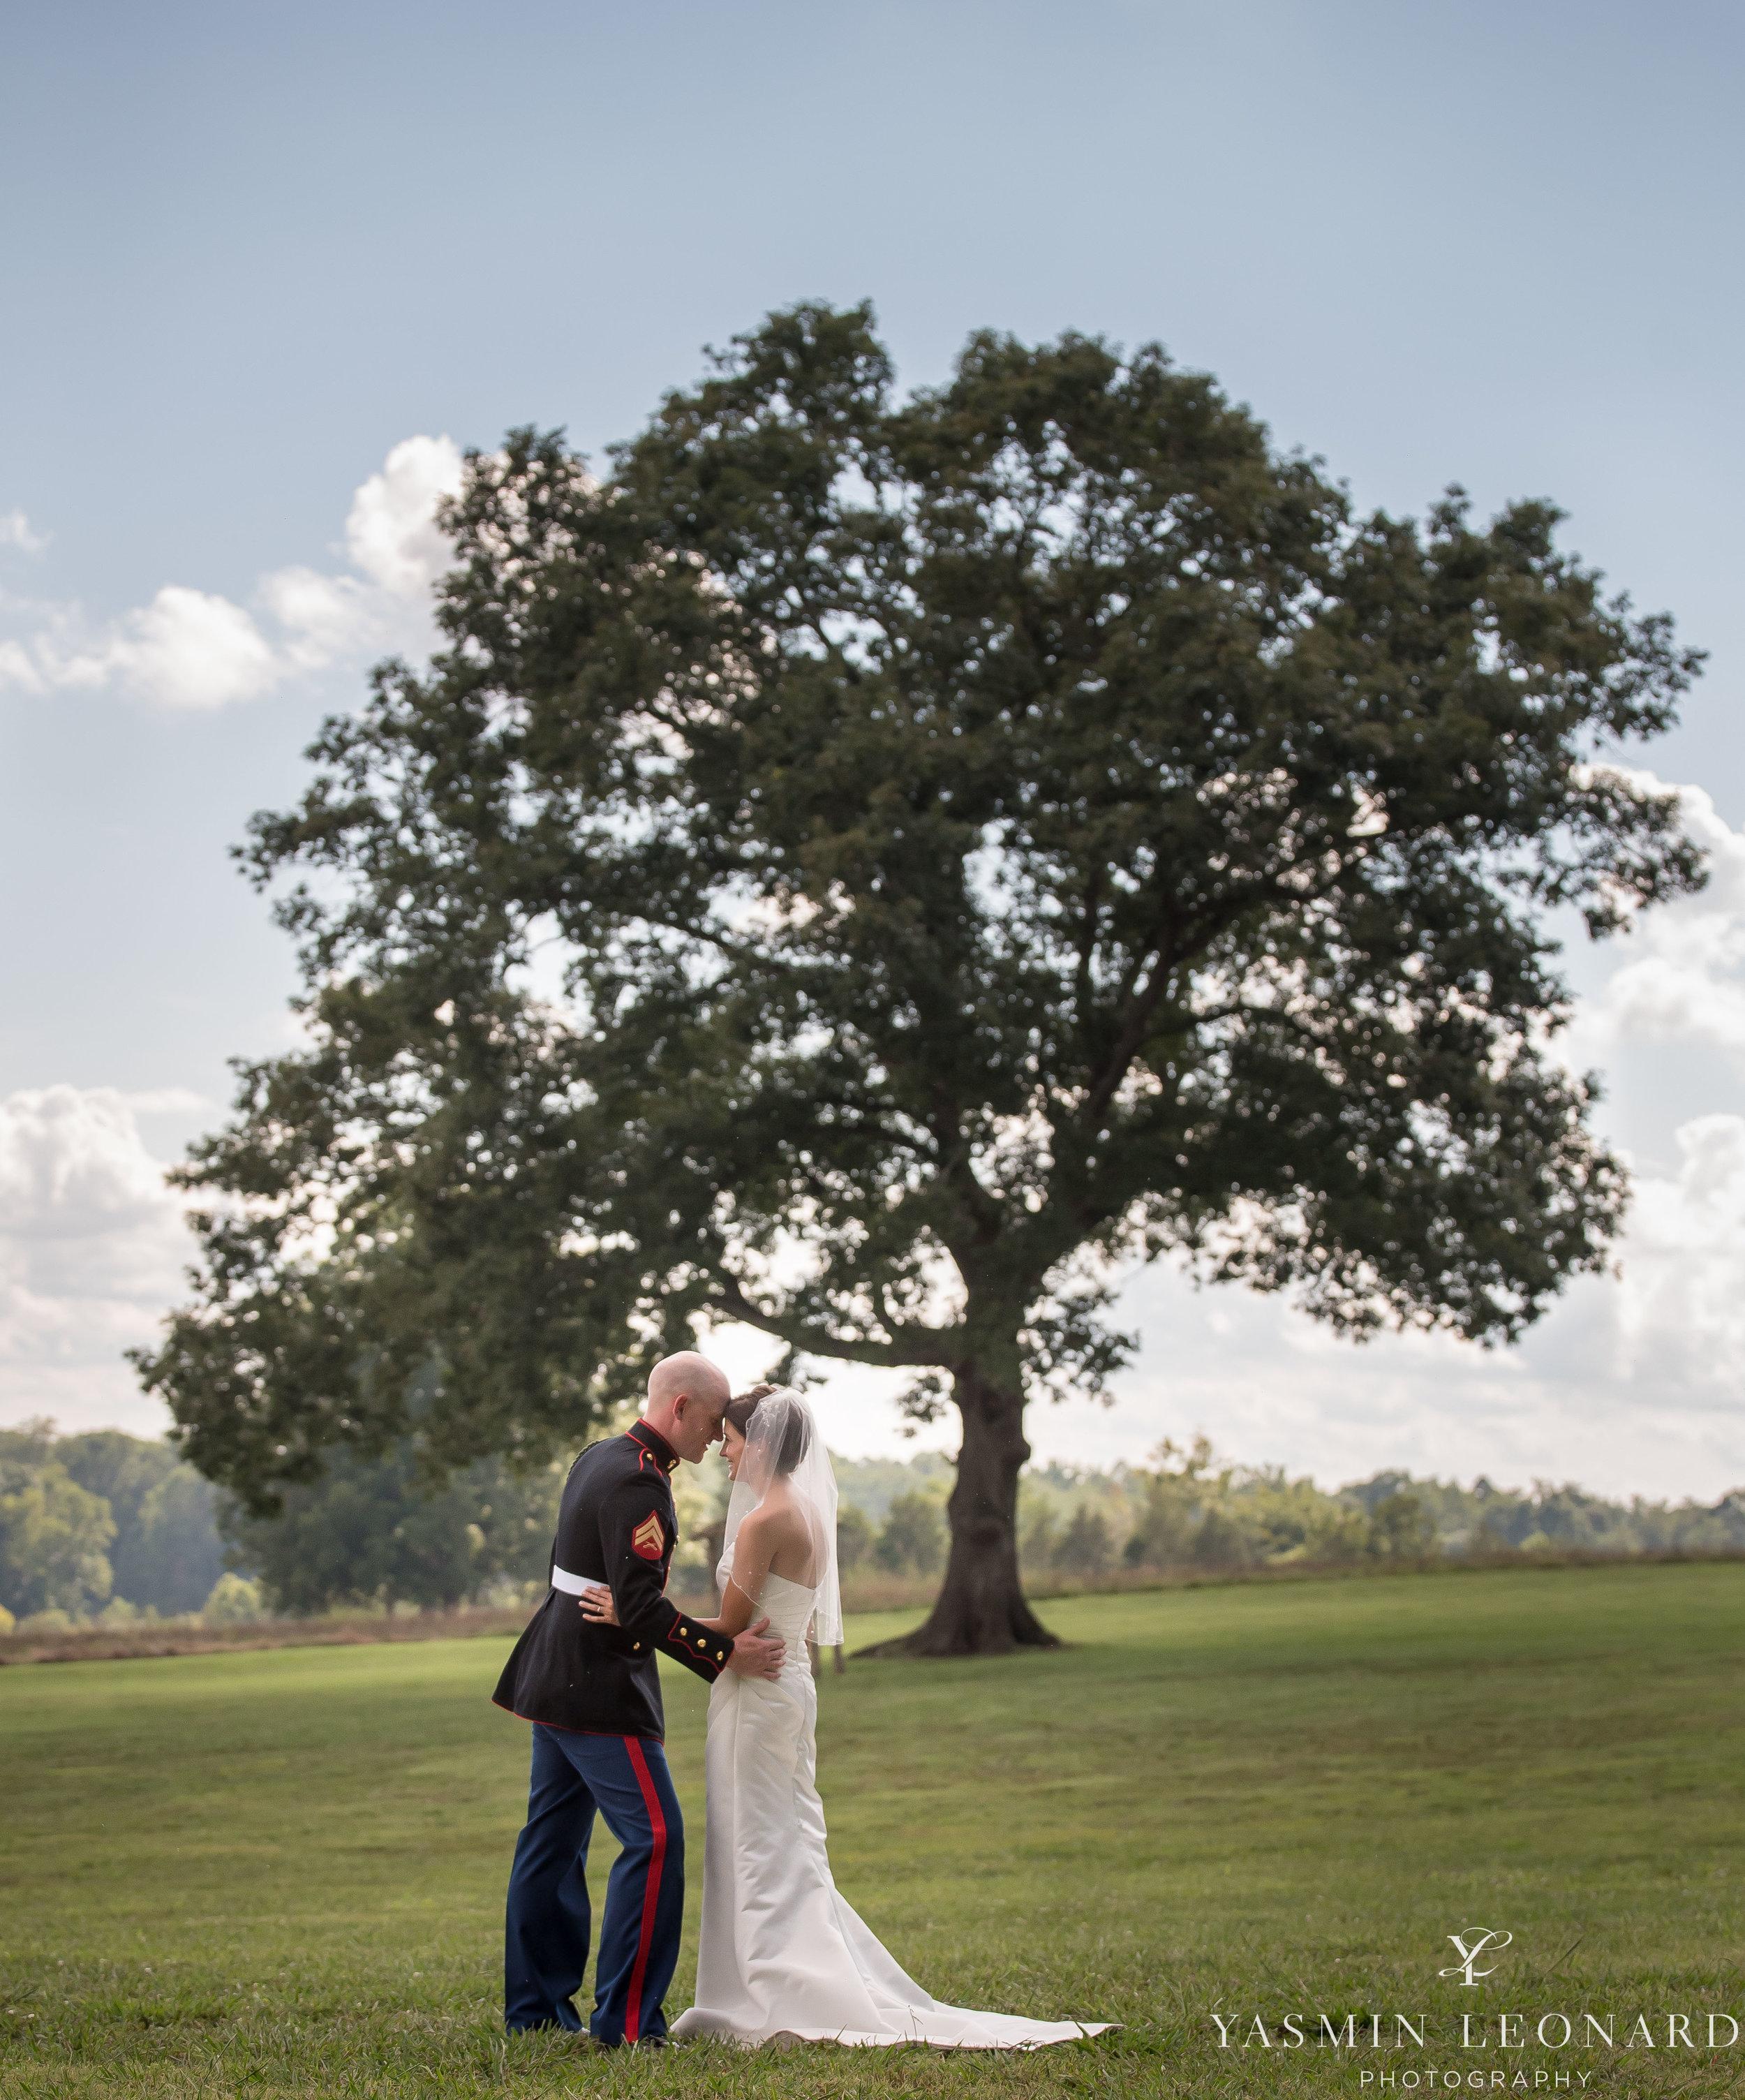 Sara and Nathan | Summerfield Farms | Yasmin Leonard Photography-31.jpg